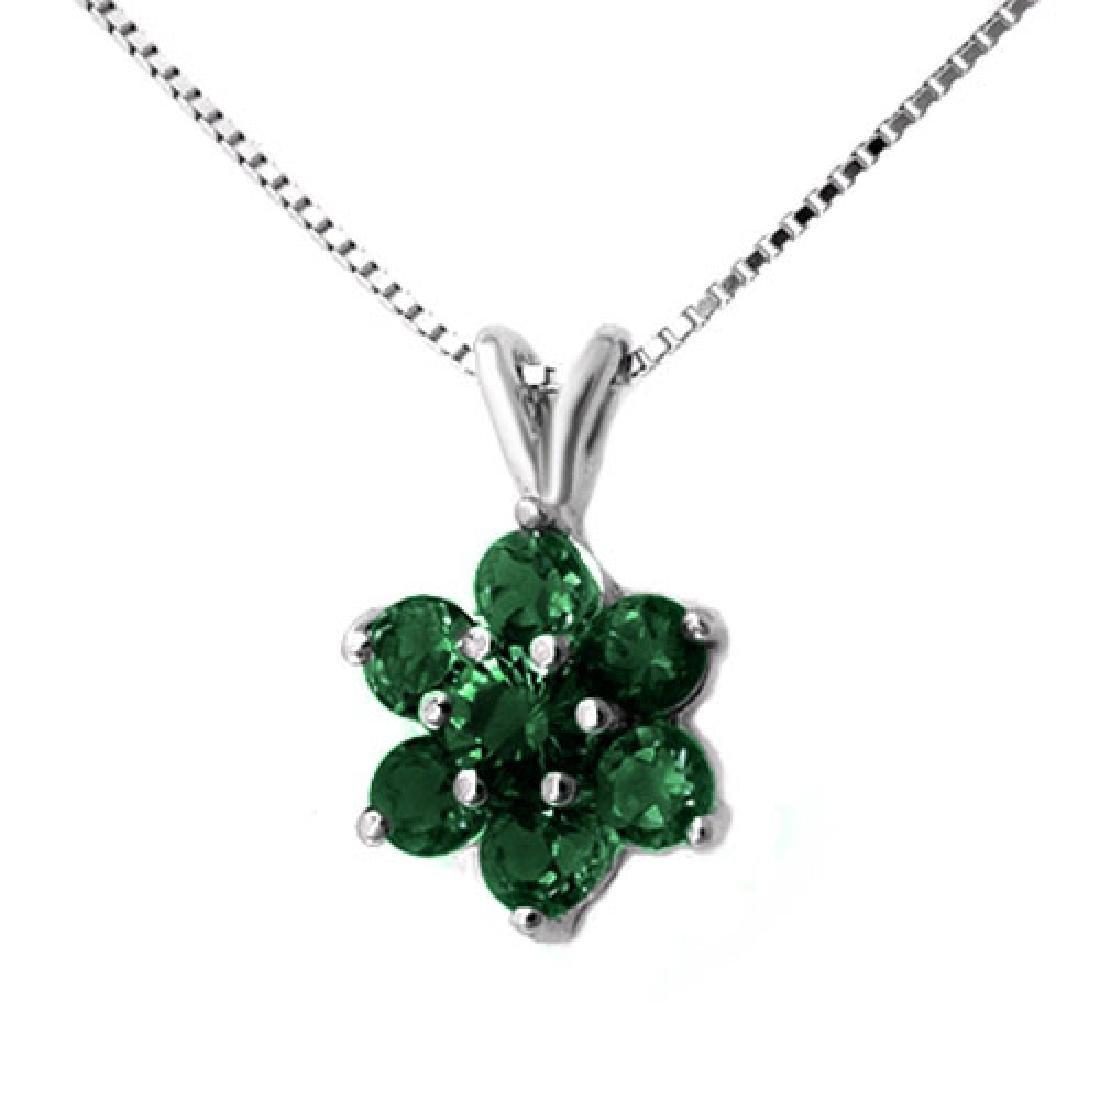 0.75 CTW Emerald Pendant 18K White Gold - 2